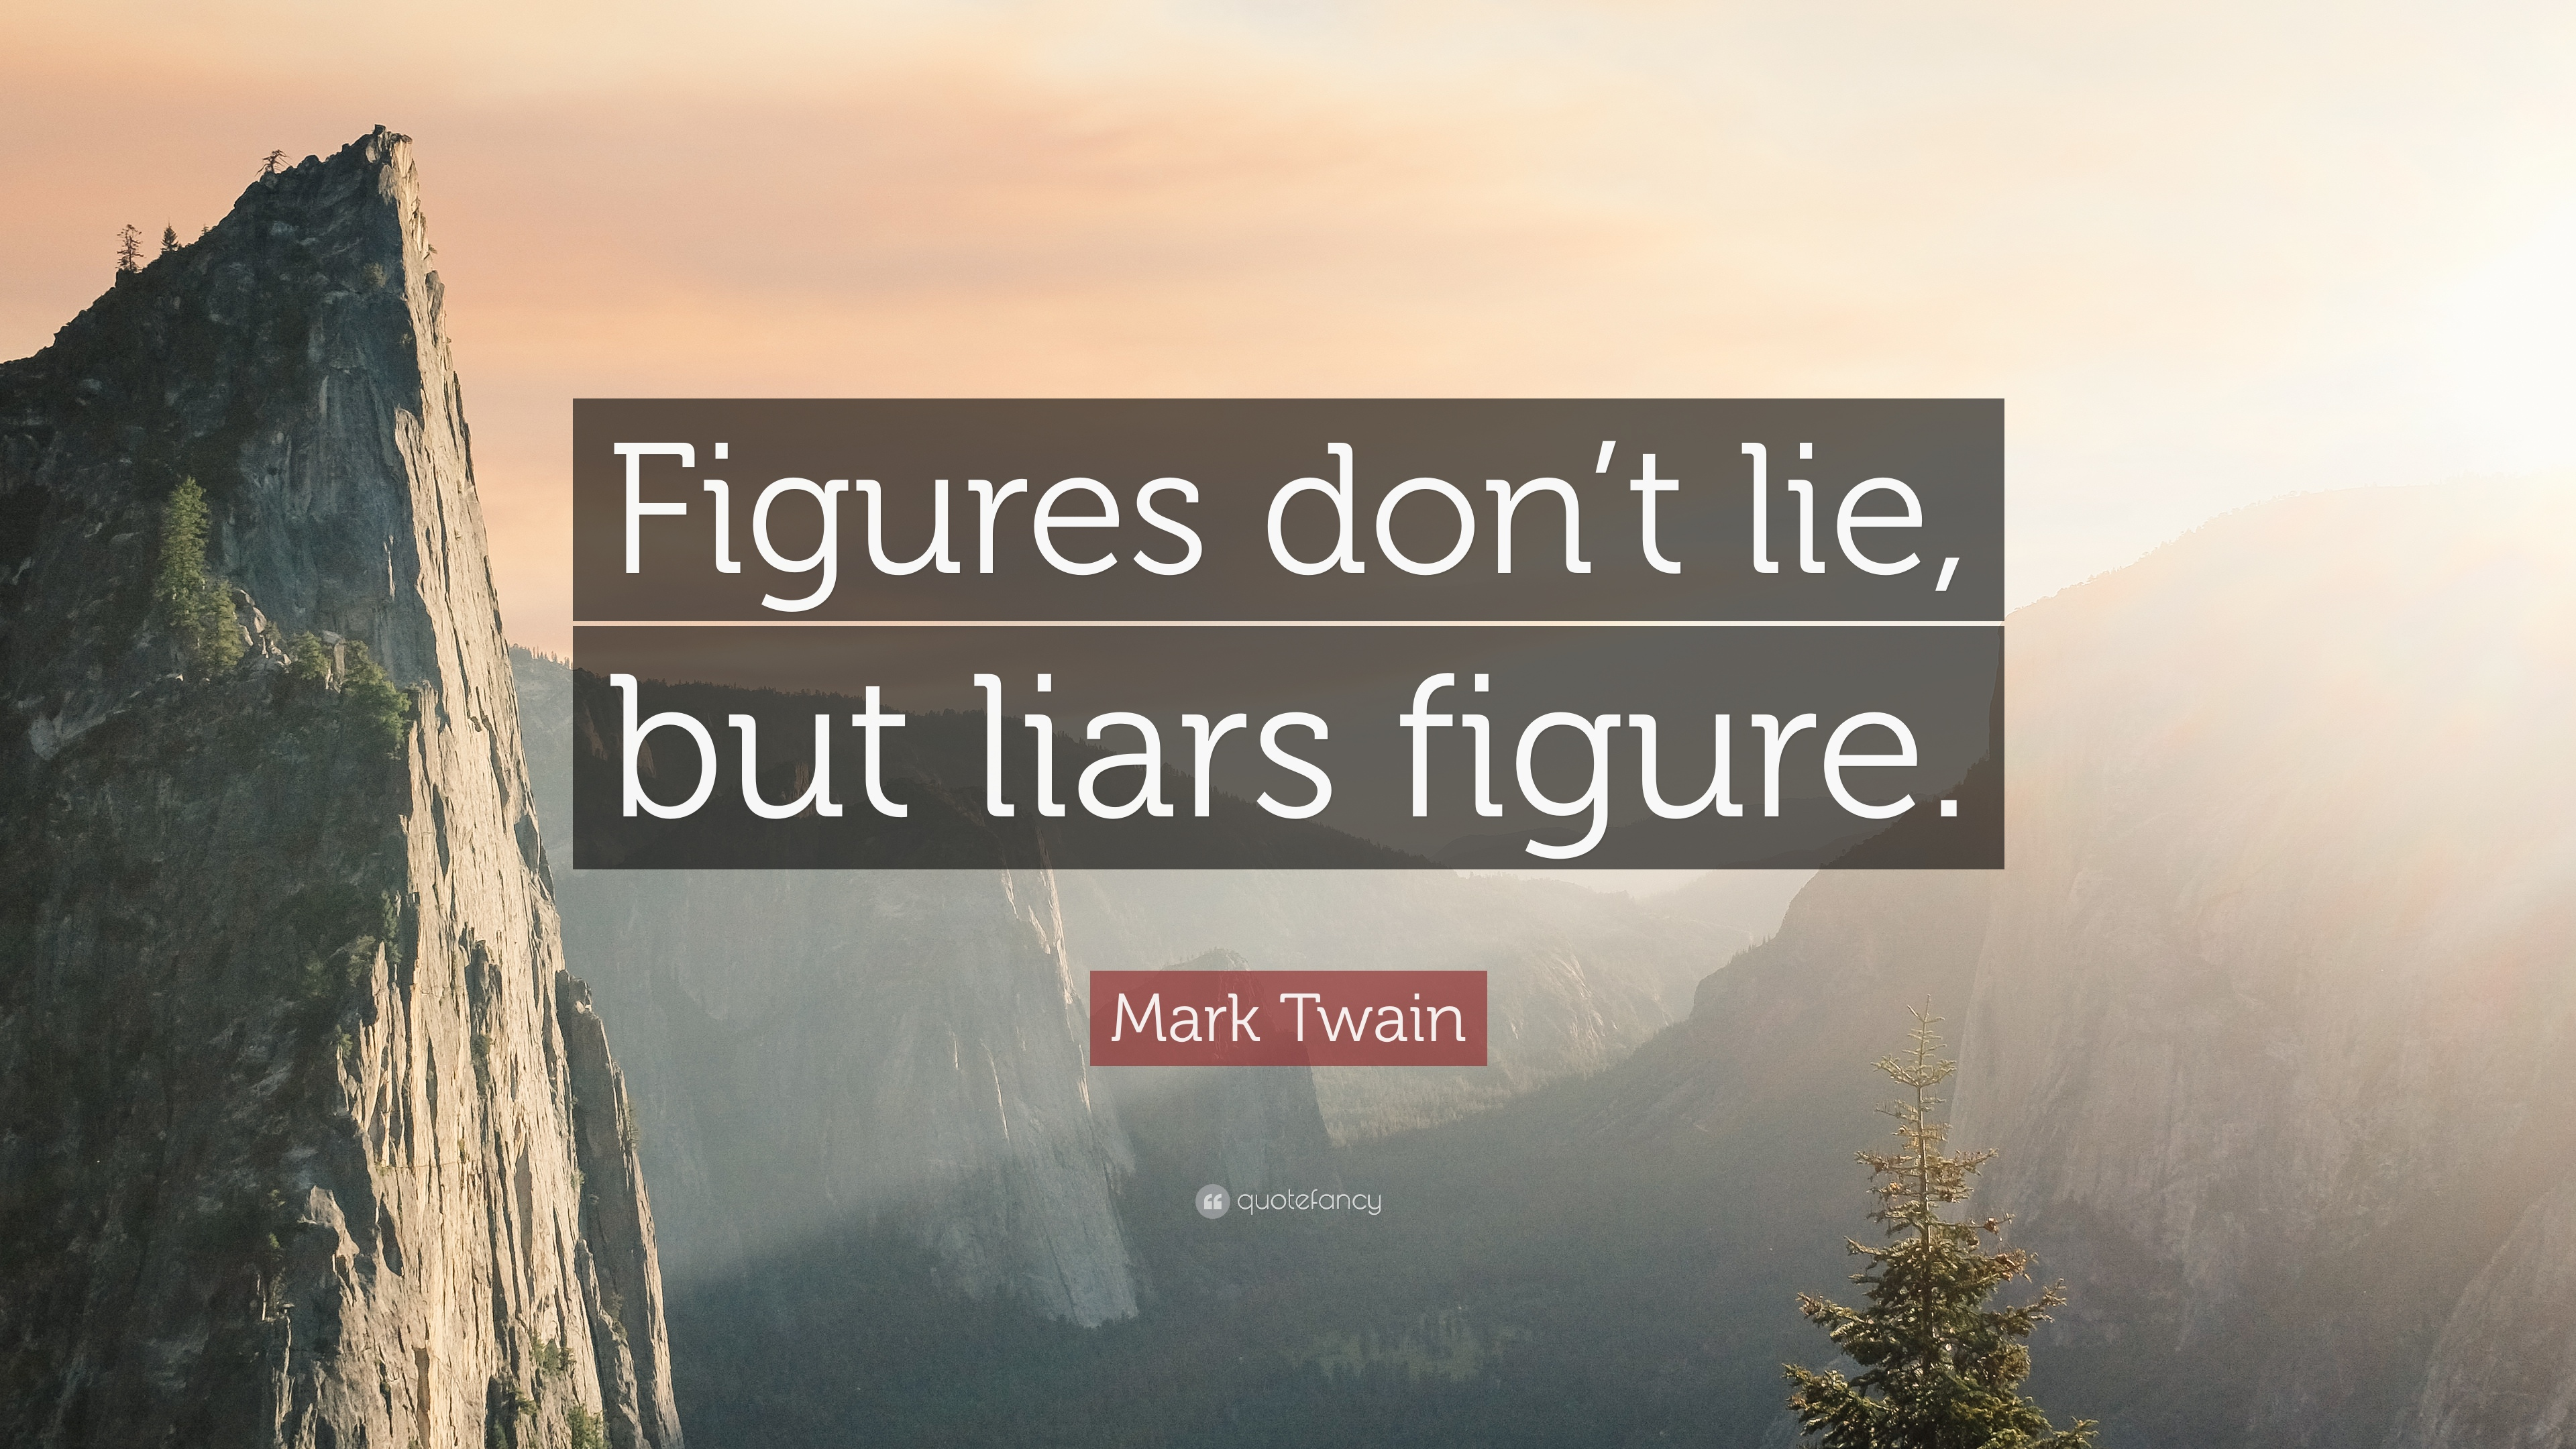 Mark Twain Quote Figures Don T Lie But Liars Figure 12 Wallpapers Quotefancy